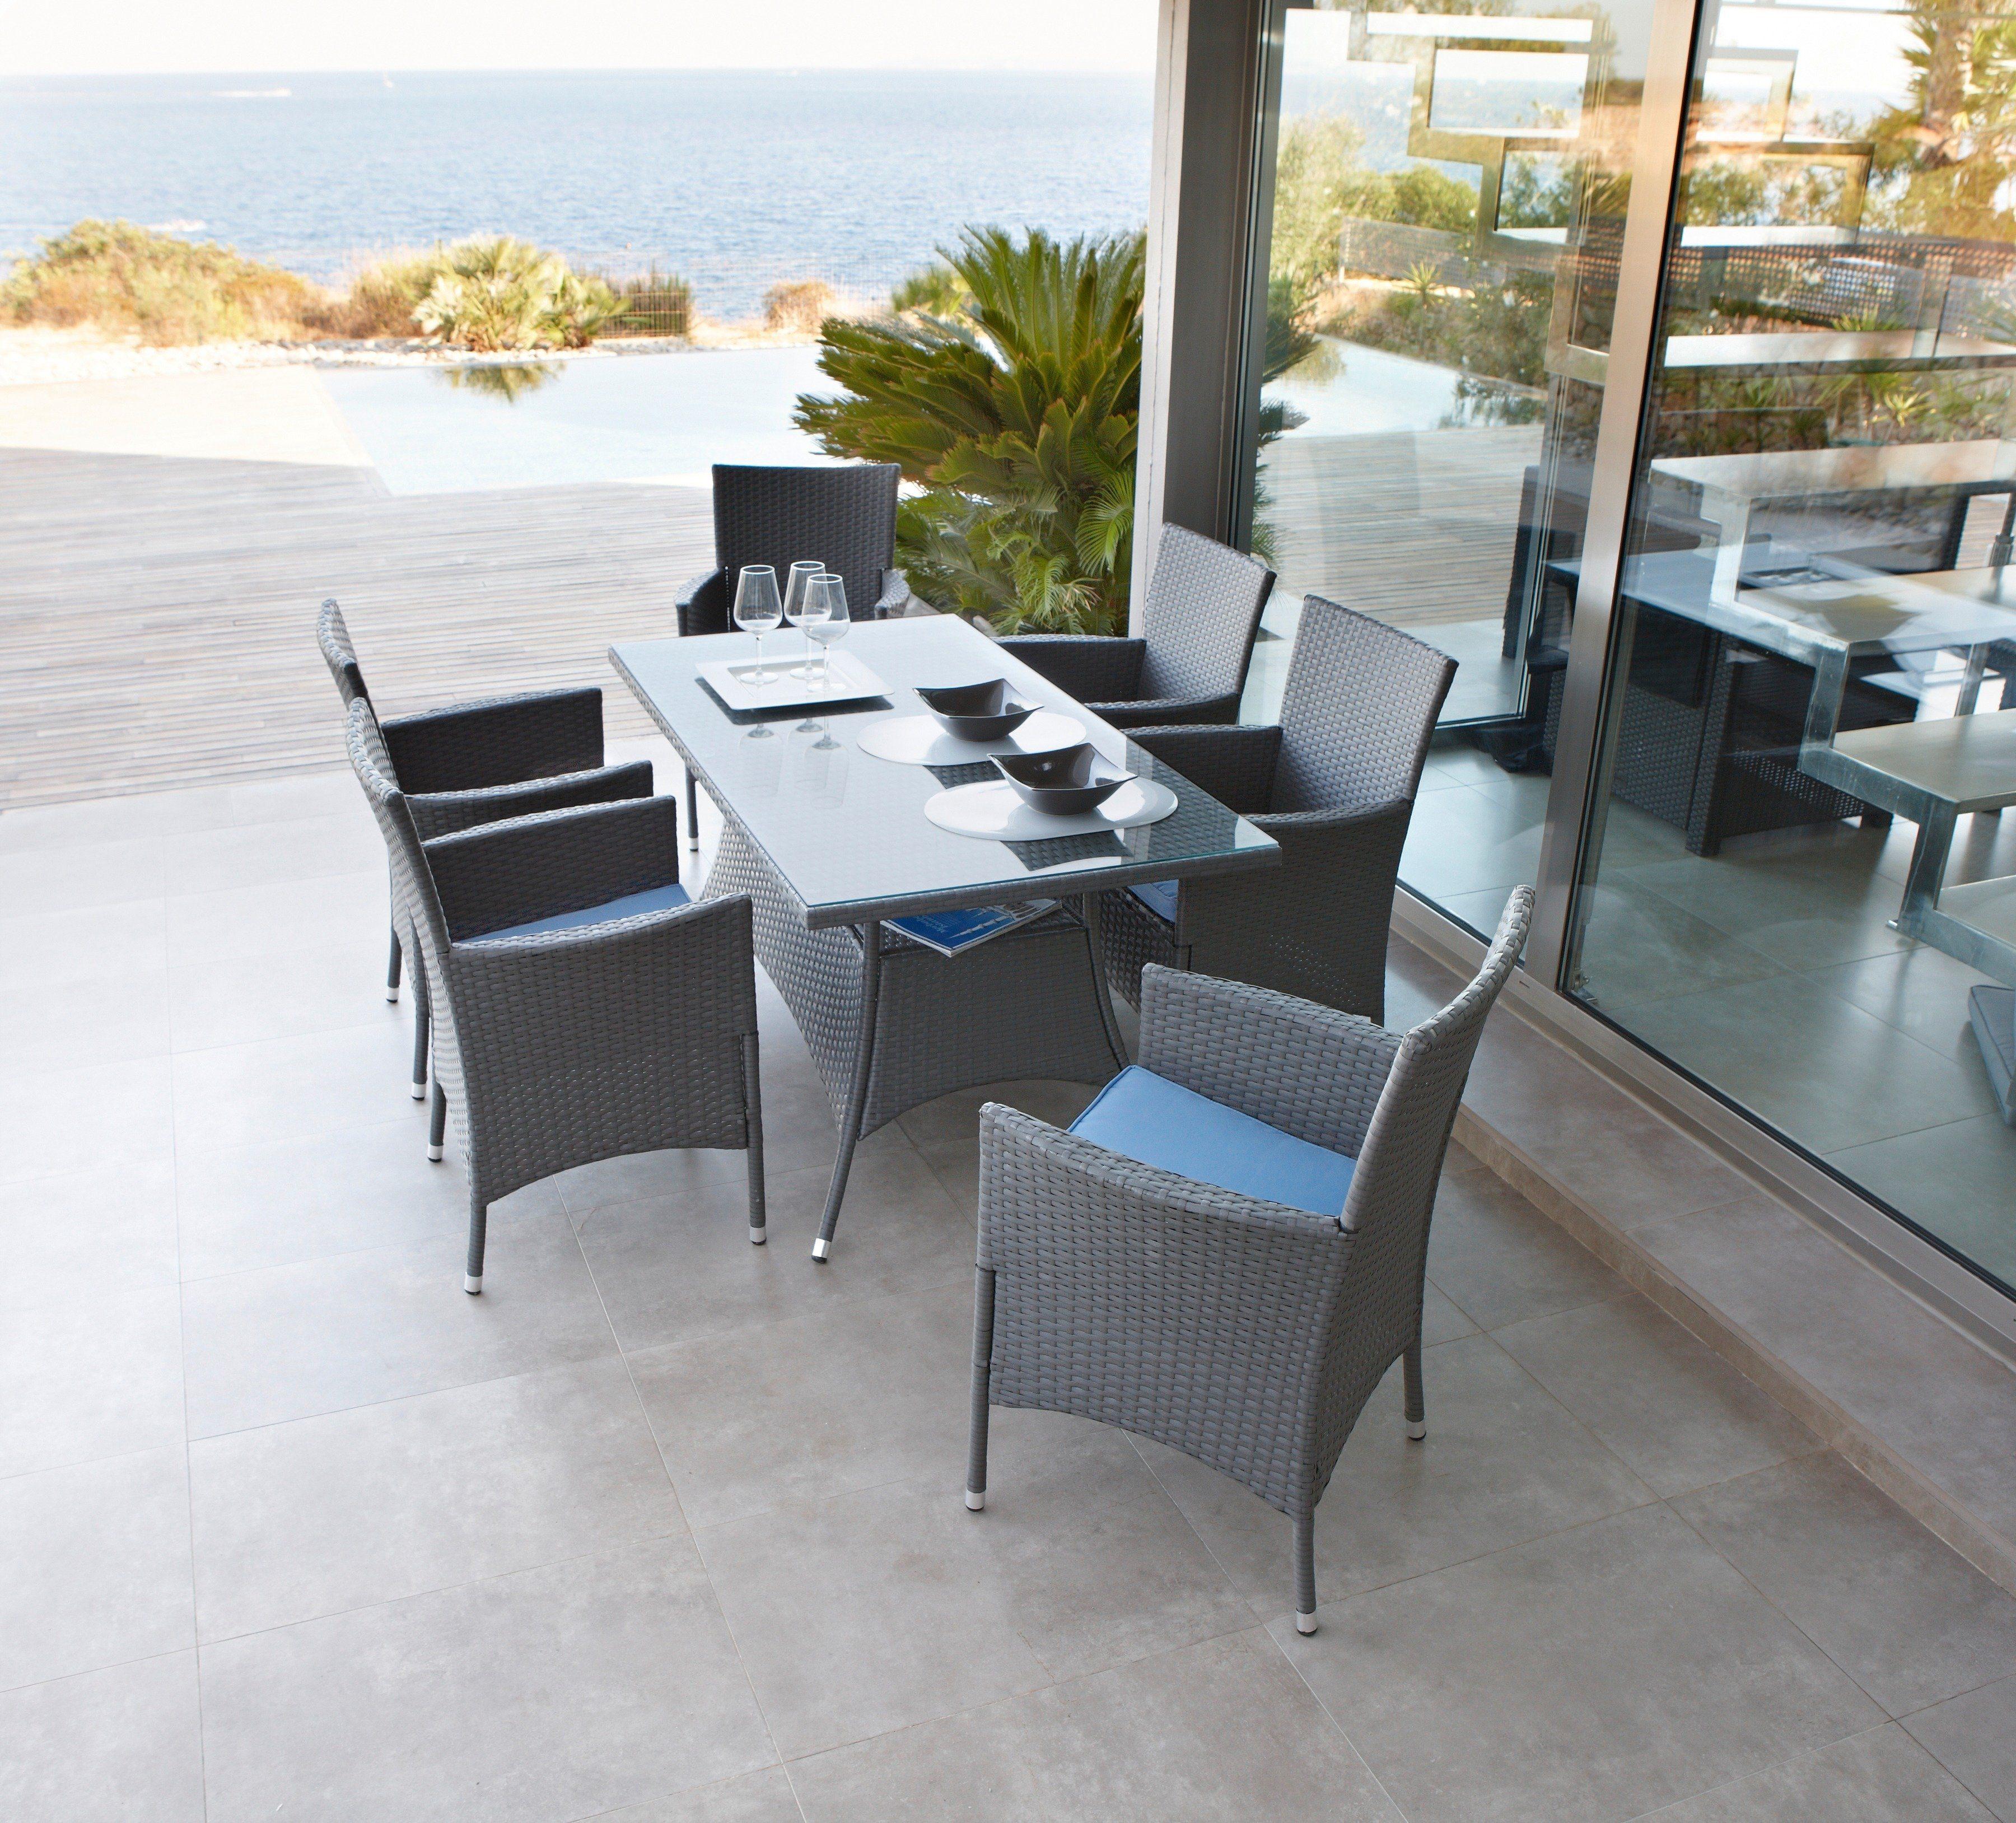 20-tgl. Gartenmöbelset »Santiago«, 6 Sessel, Tisch150x80 cm,Polyrattan, grau